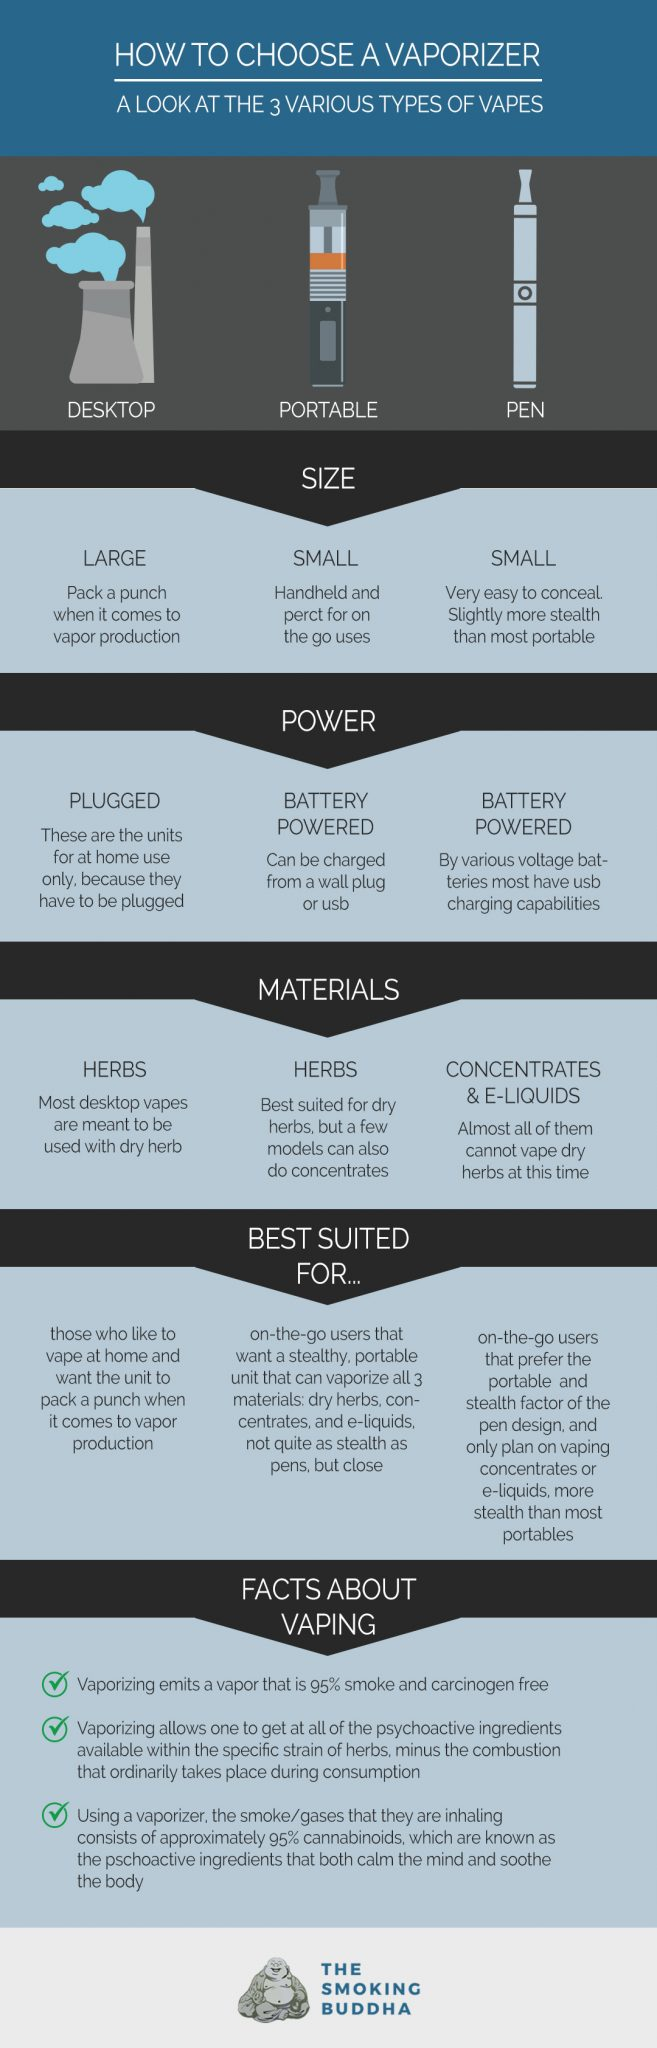 How to Choose a Vaporizer